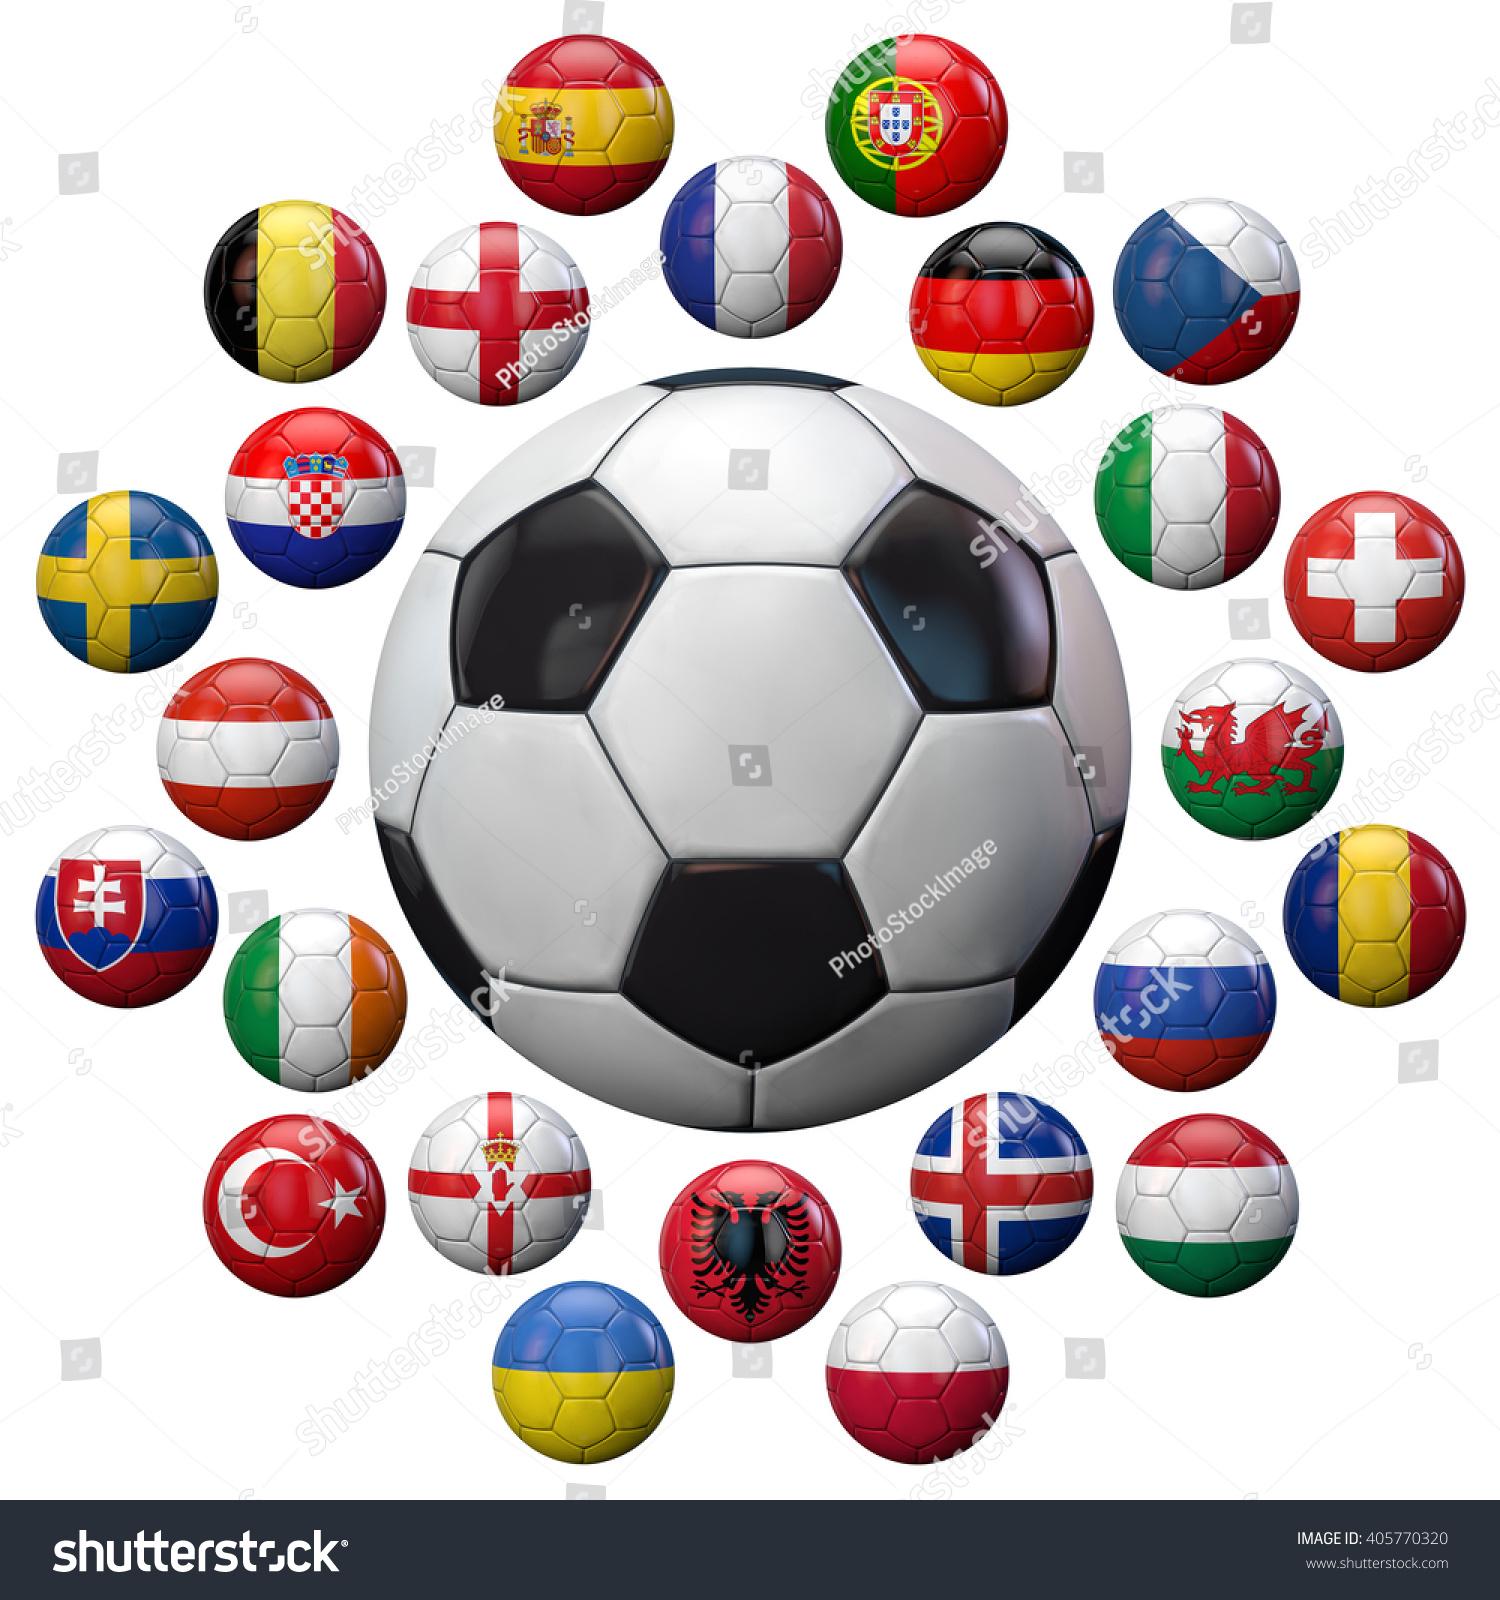 football 2016 uefa european championship football stock illustration 405770320 shutterstock. Black Bedroom Furniture Sets. Home Design Ideas